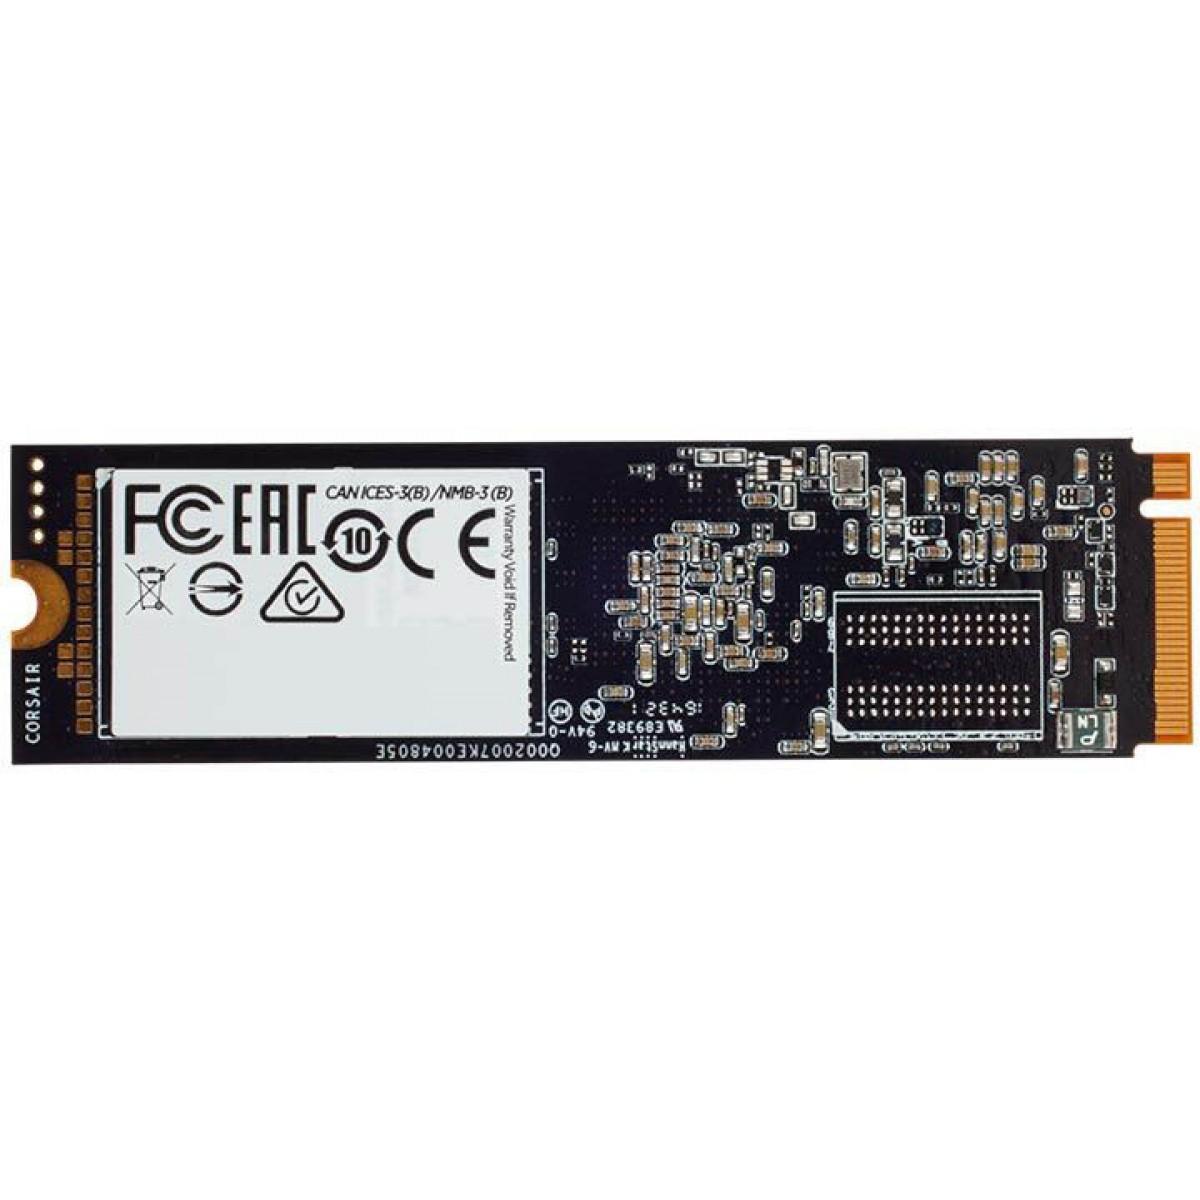 SSD Corsair Force MP510, 960GB, M.2 2280, NVMe, Leitura 3480MBs Gravação 3000MBs, CSSD-F960GBMP510B